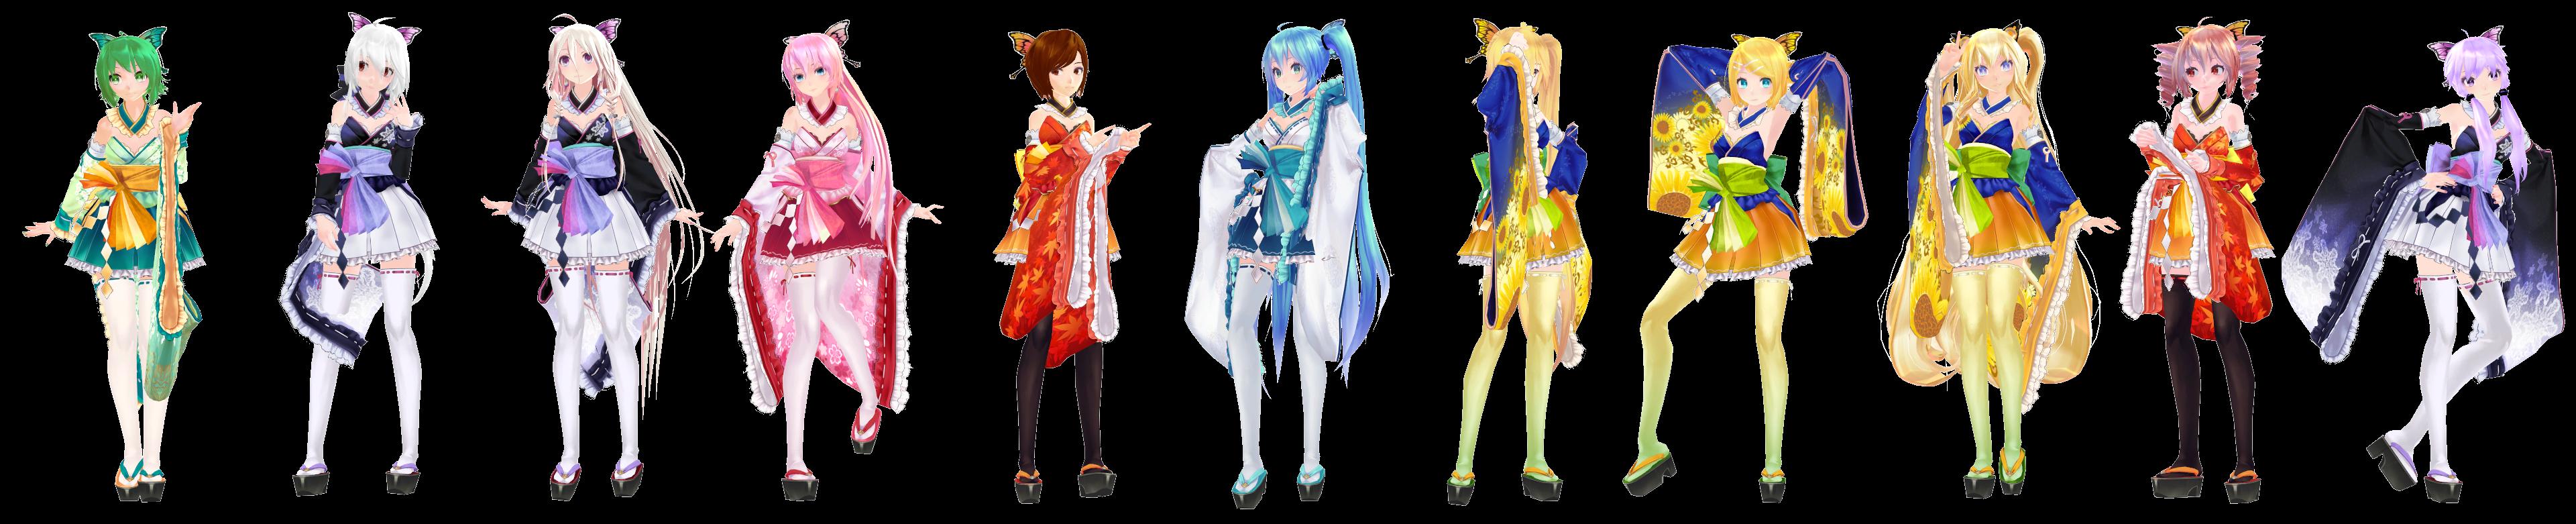 MMD Model Pack: TDA Kimono Girls by K-Manoc1